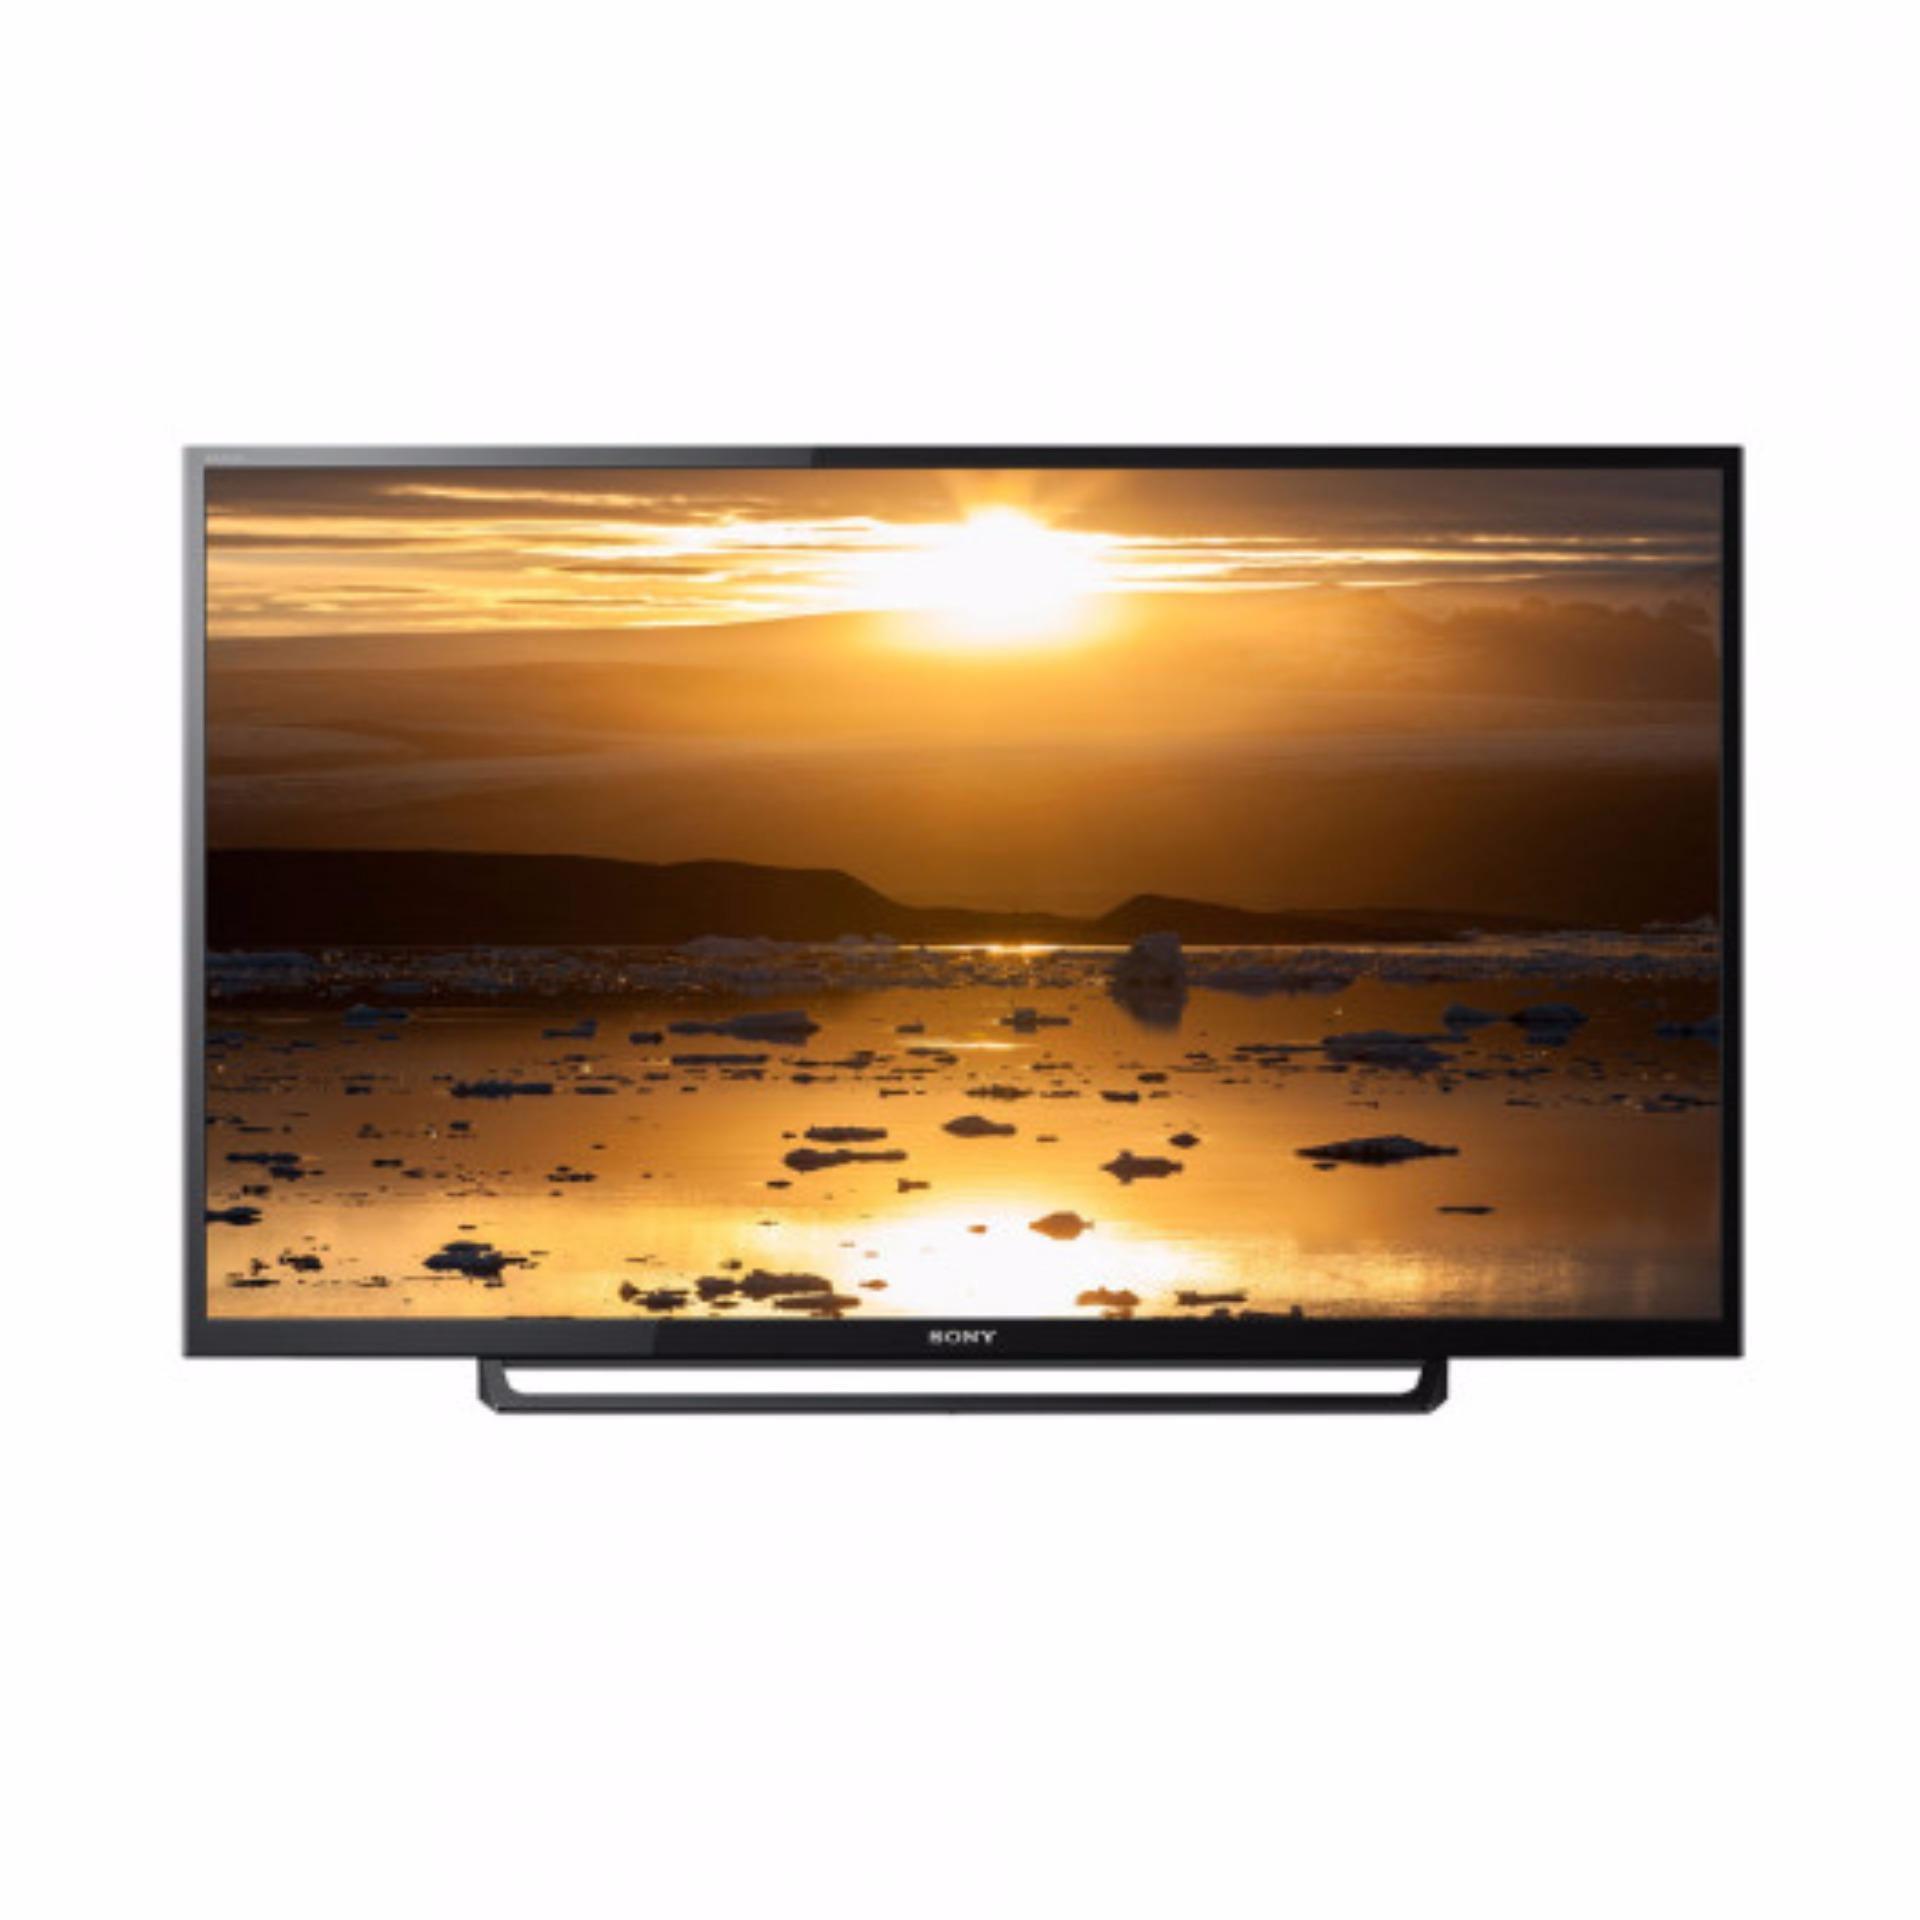 Sony 40 Inch Full Hd Led Tv Kdl40r350e Singapore Kdl 48w650d Smart 48